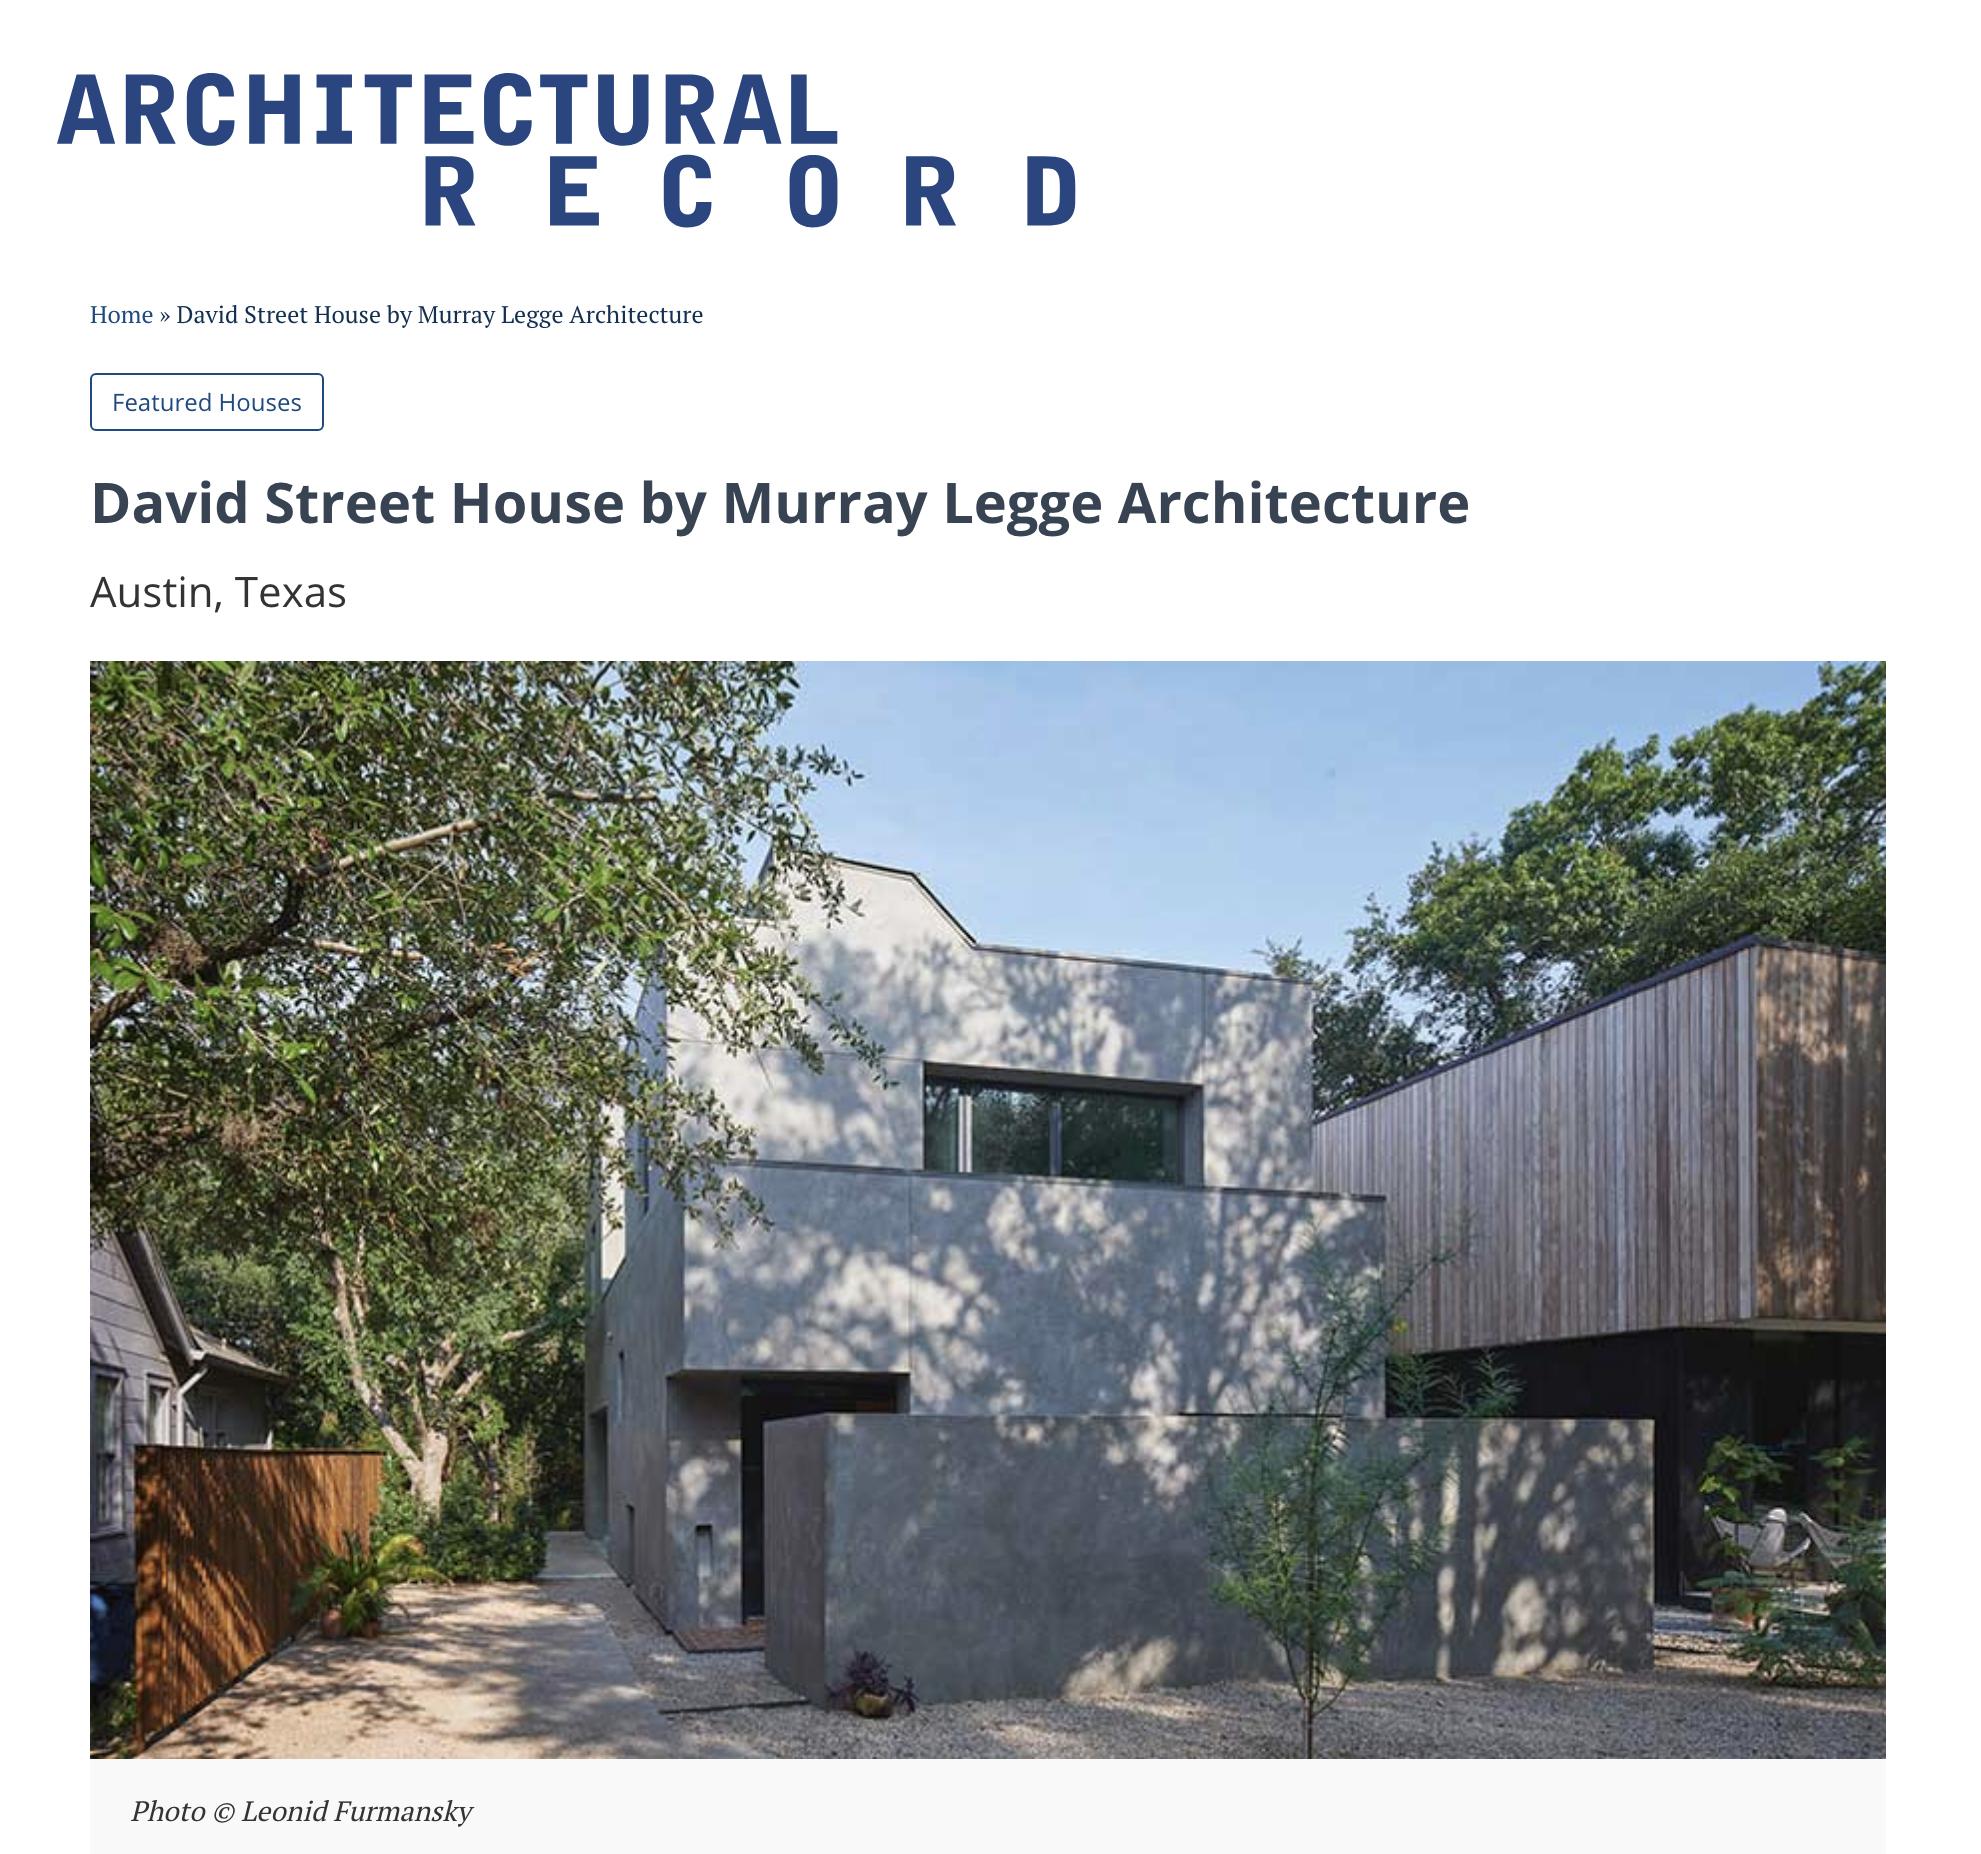 David Street House Arch Record.jpg